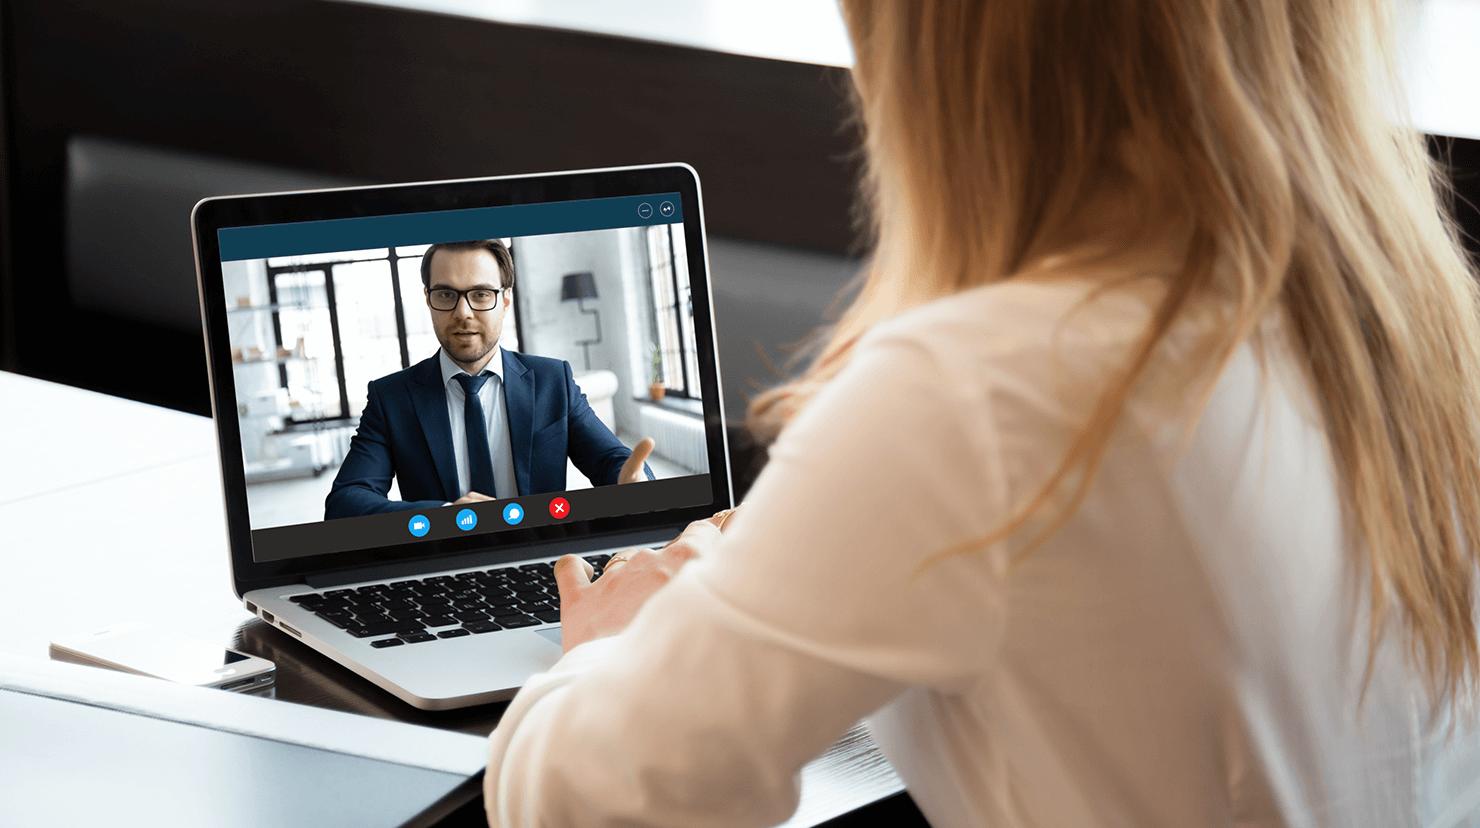 Woman talking to a man on a laptop